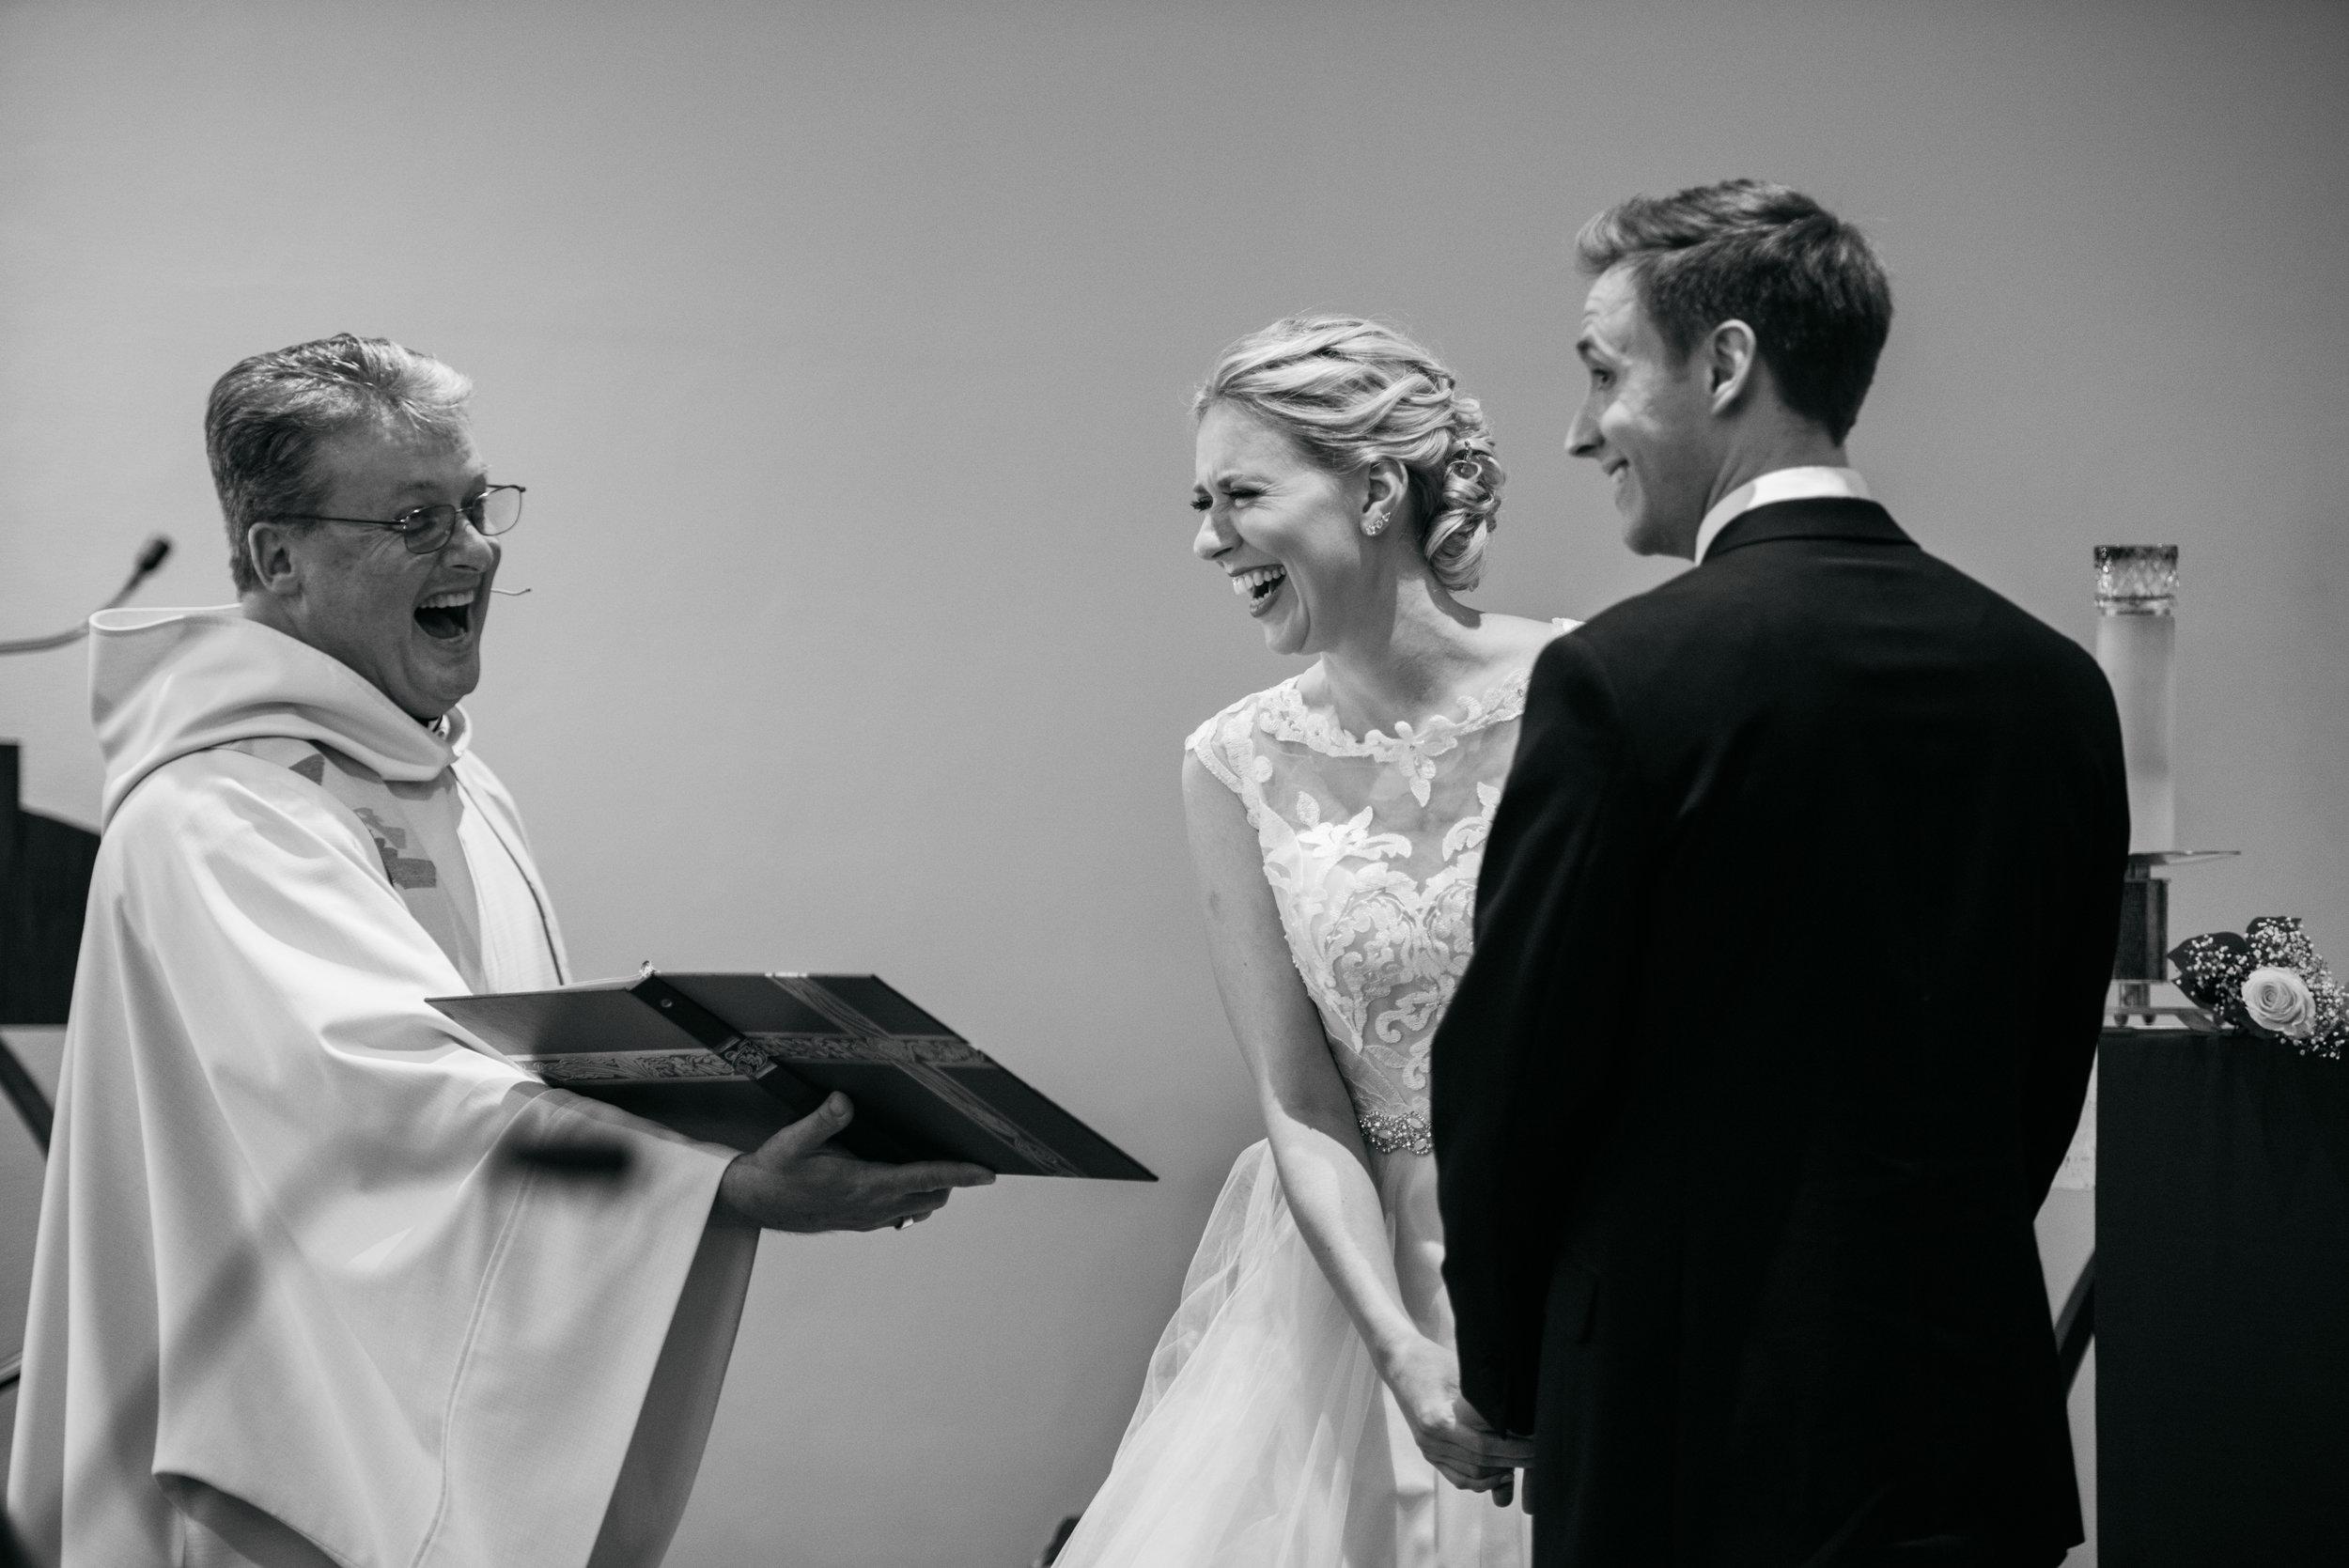 WeddingPhotos | NJPhotographer | Highlights-5-17.jpg